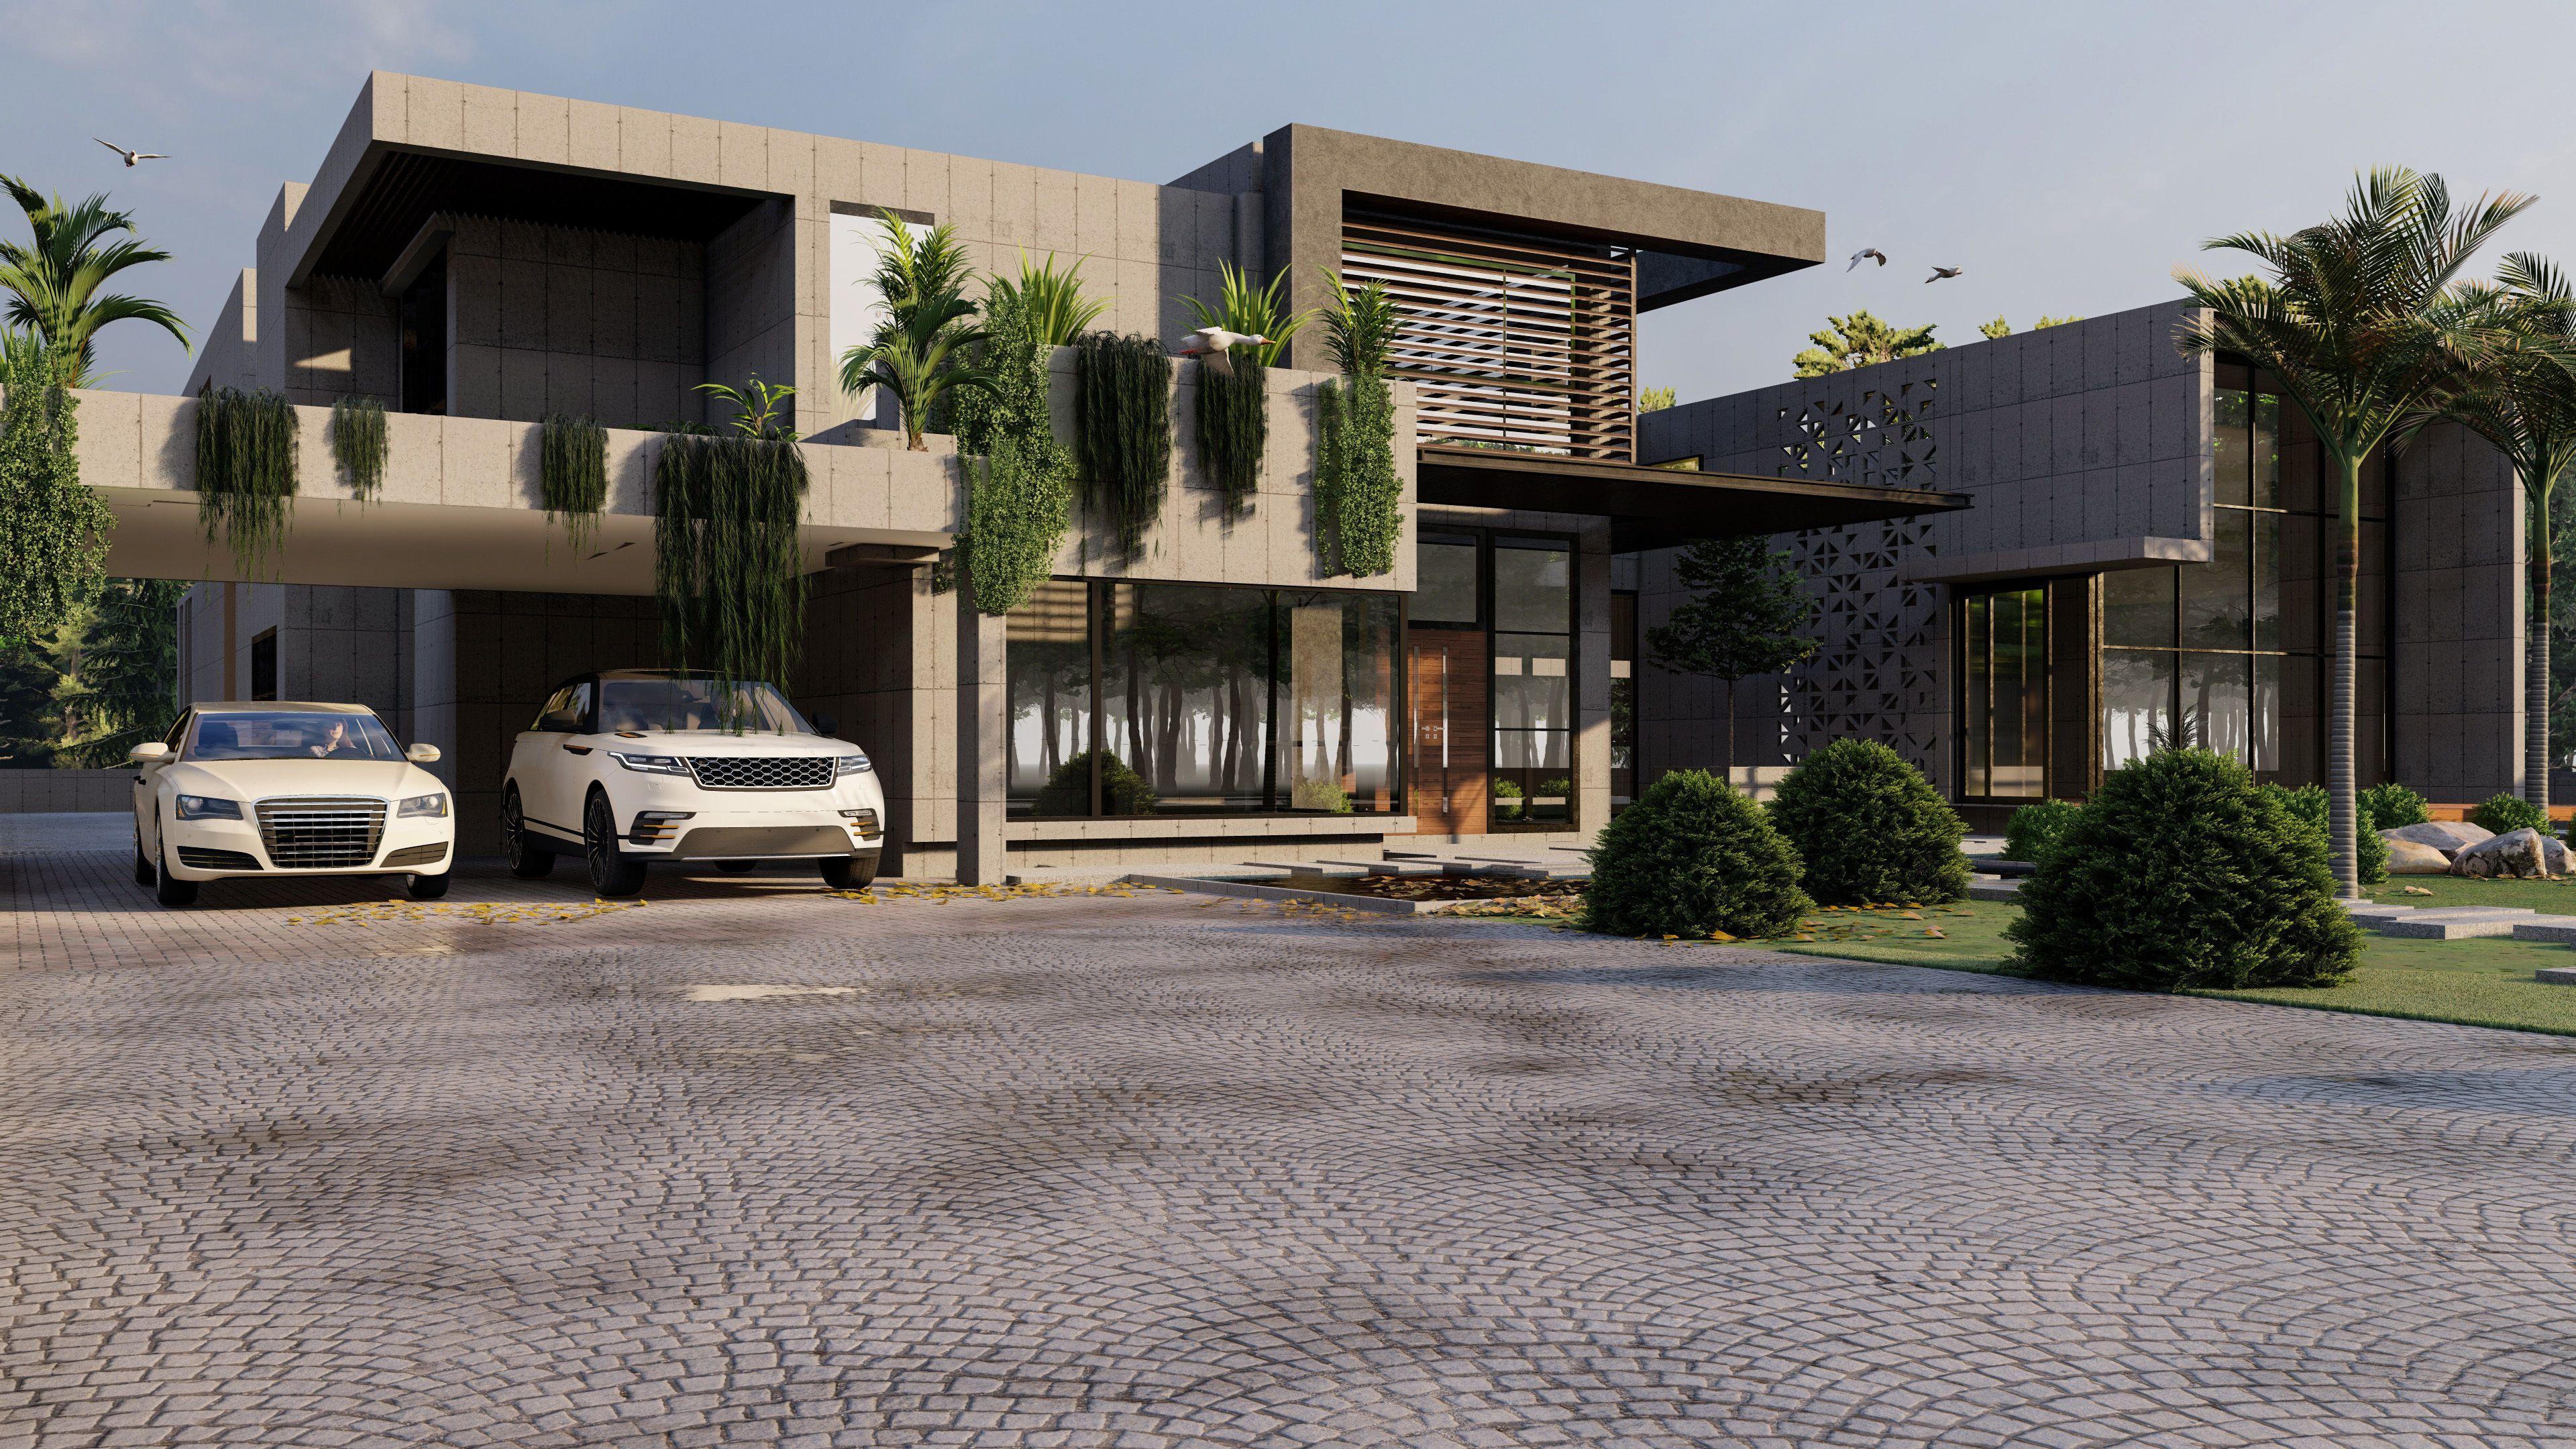 Modern Luxury House Model And Render Modern House 3d House Designs Exterior Luxury House House Design